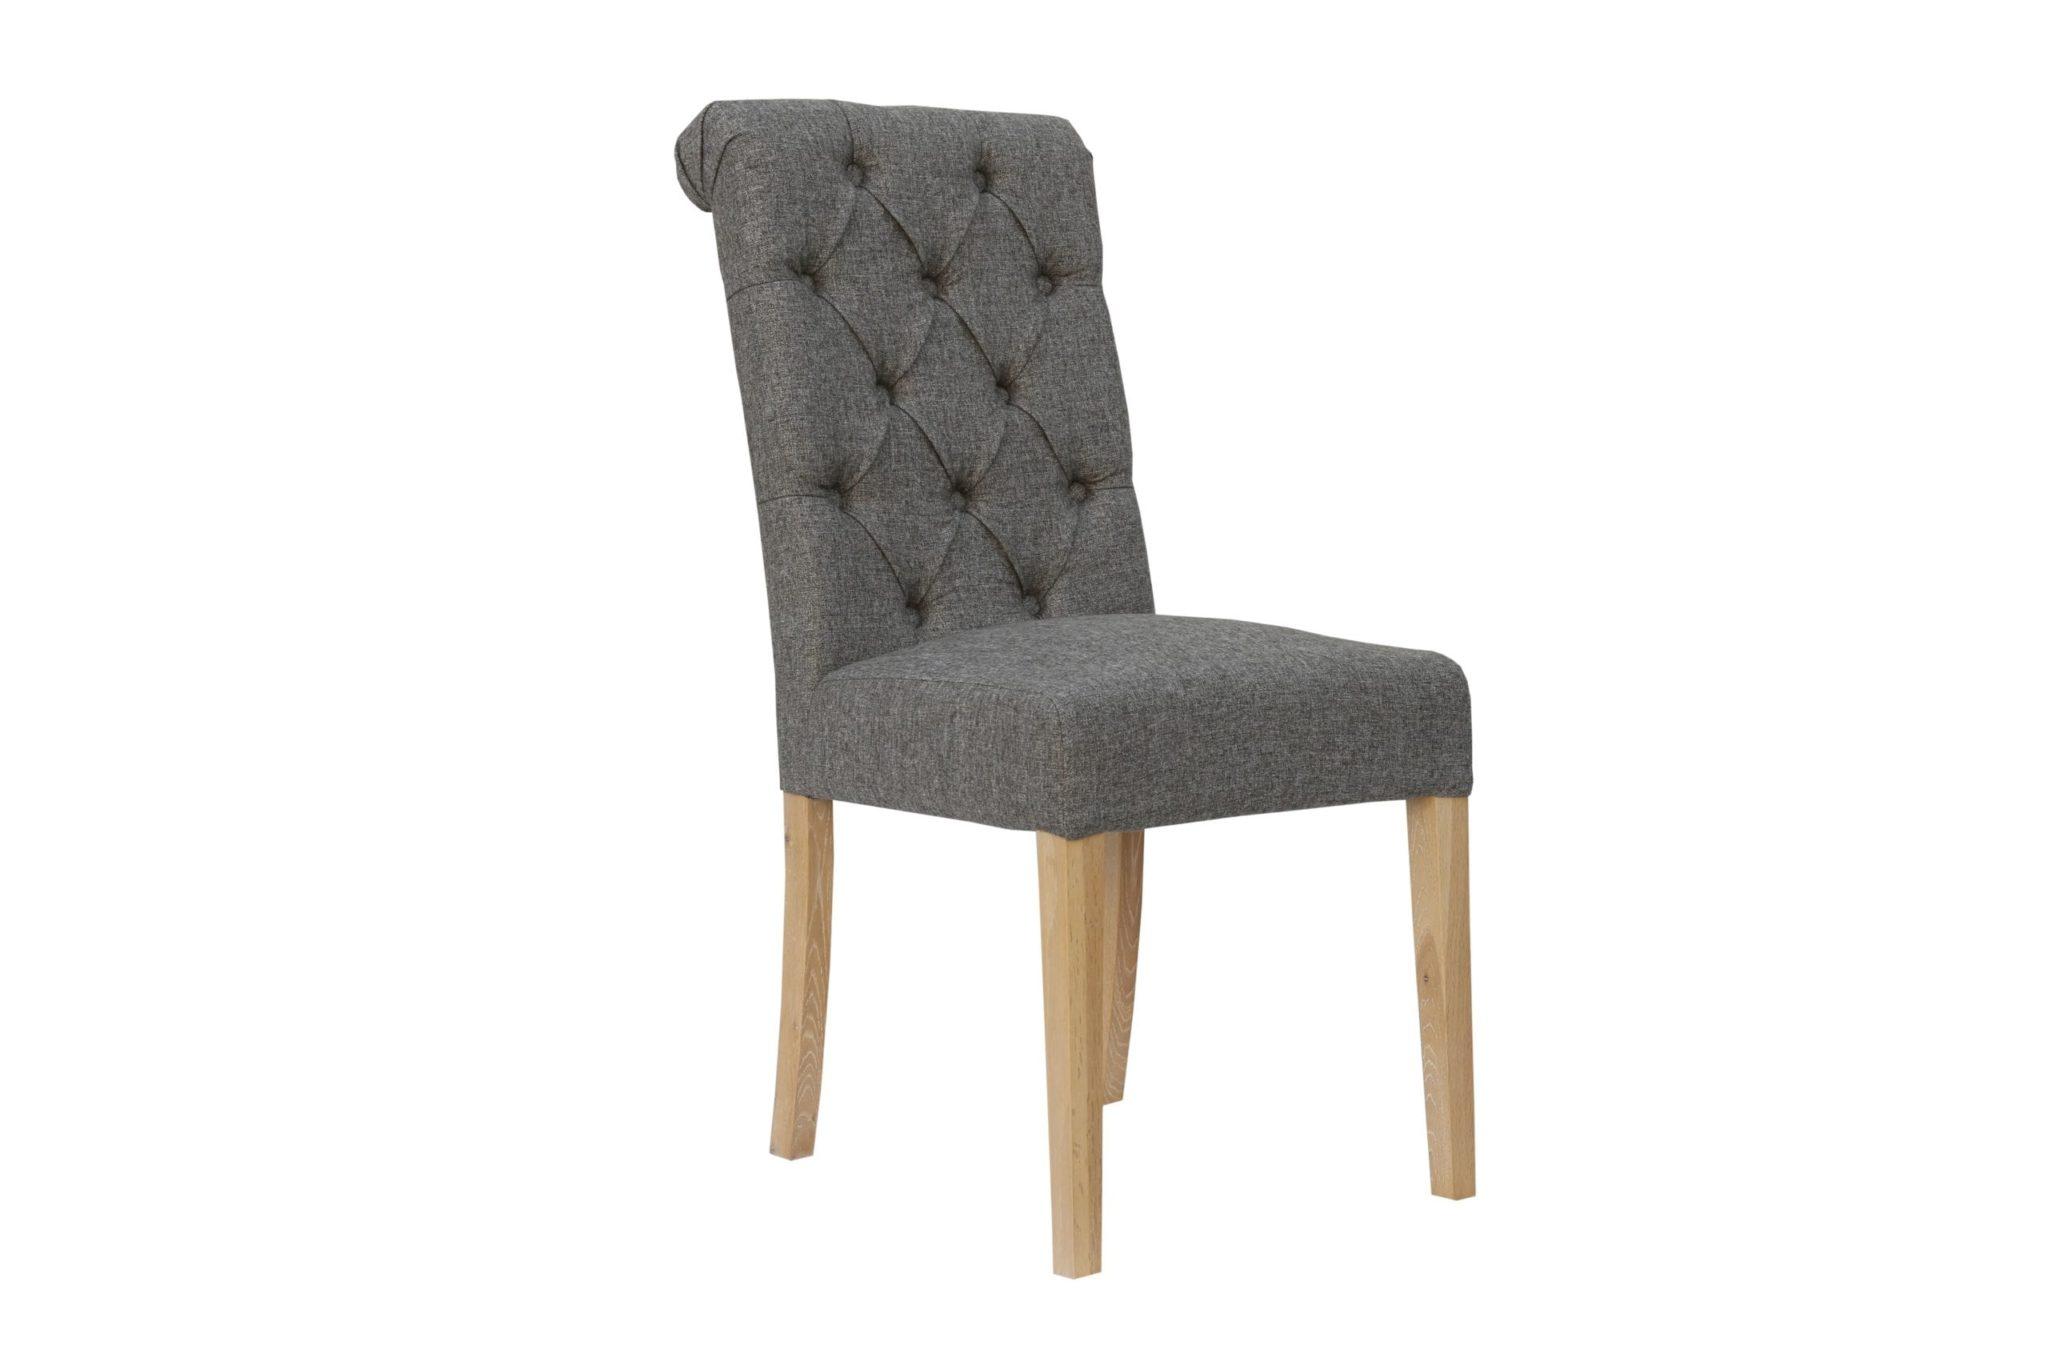 CH28DG Cavendish button back scroll top chair - dark grey and oak legs